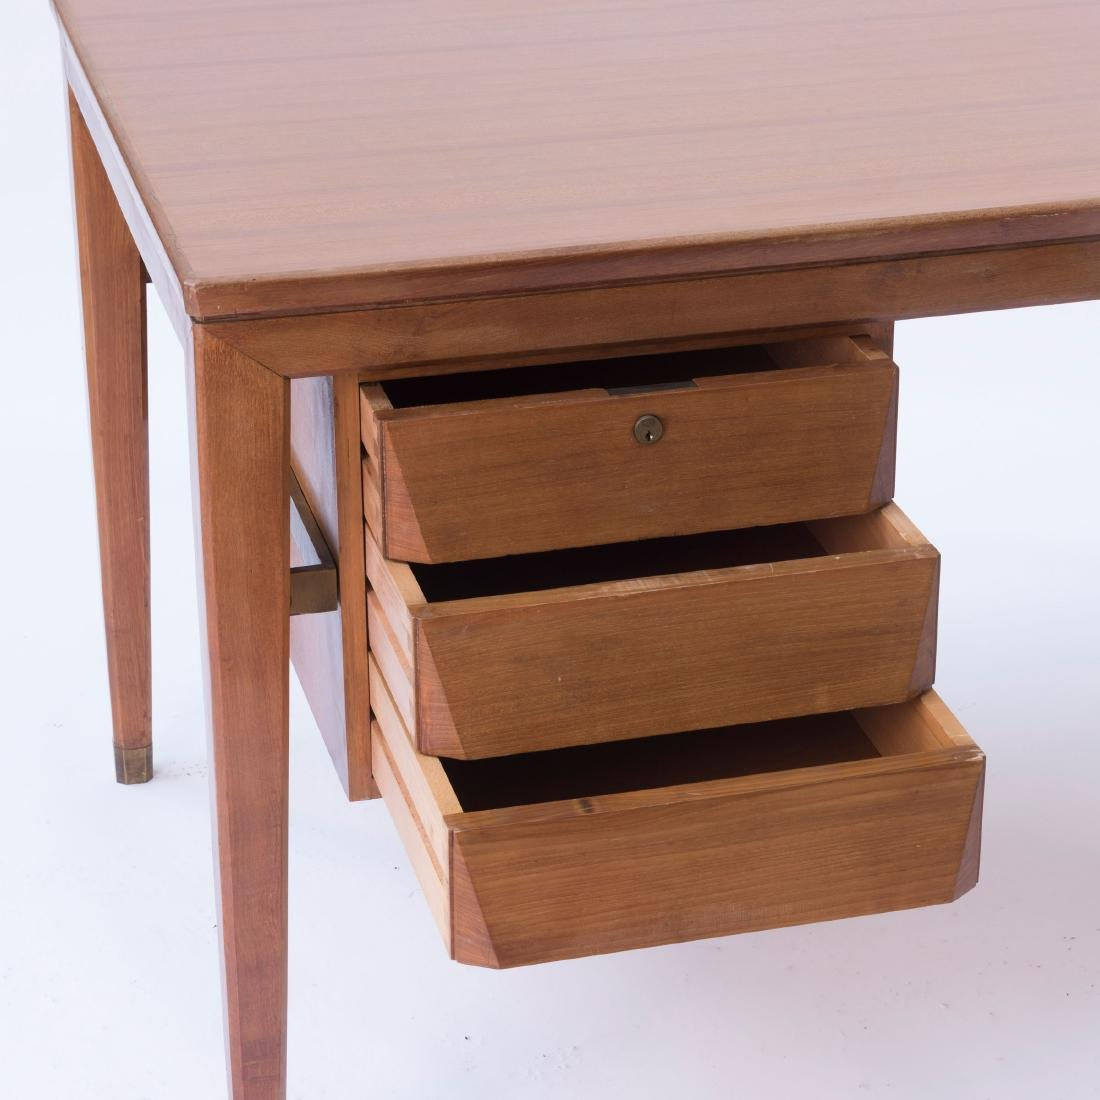 'BNL' desk, 1954 - 3